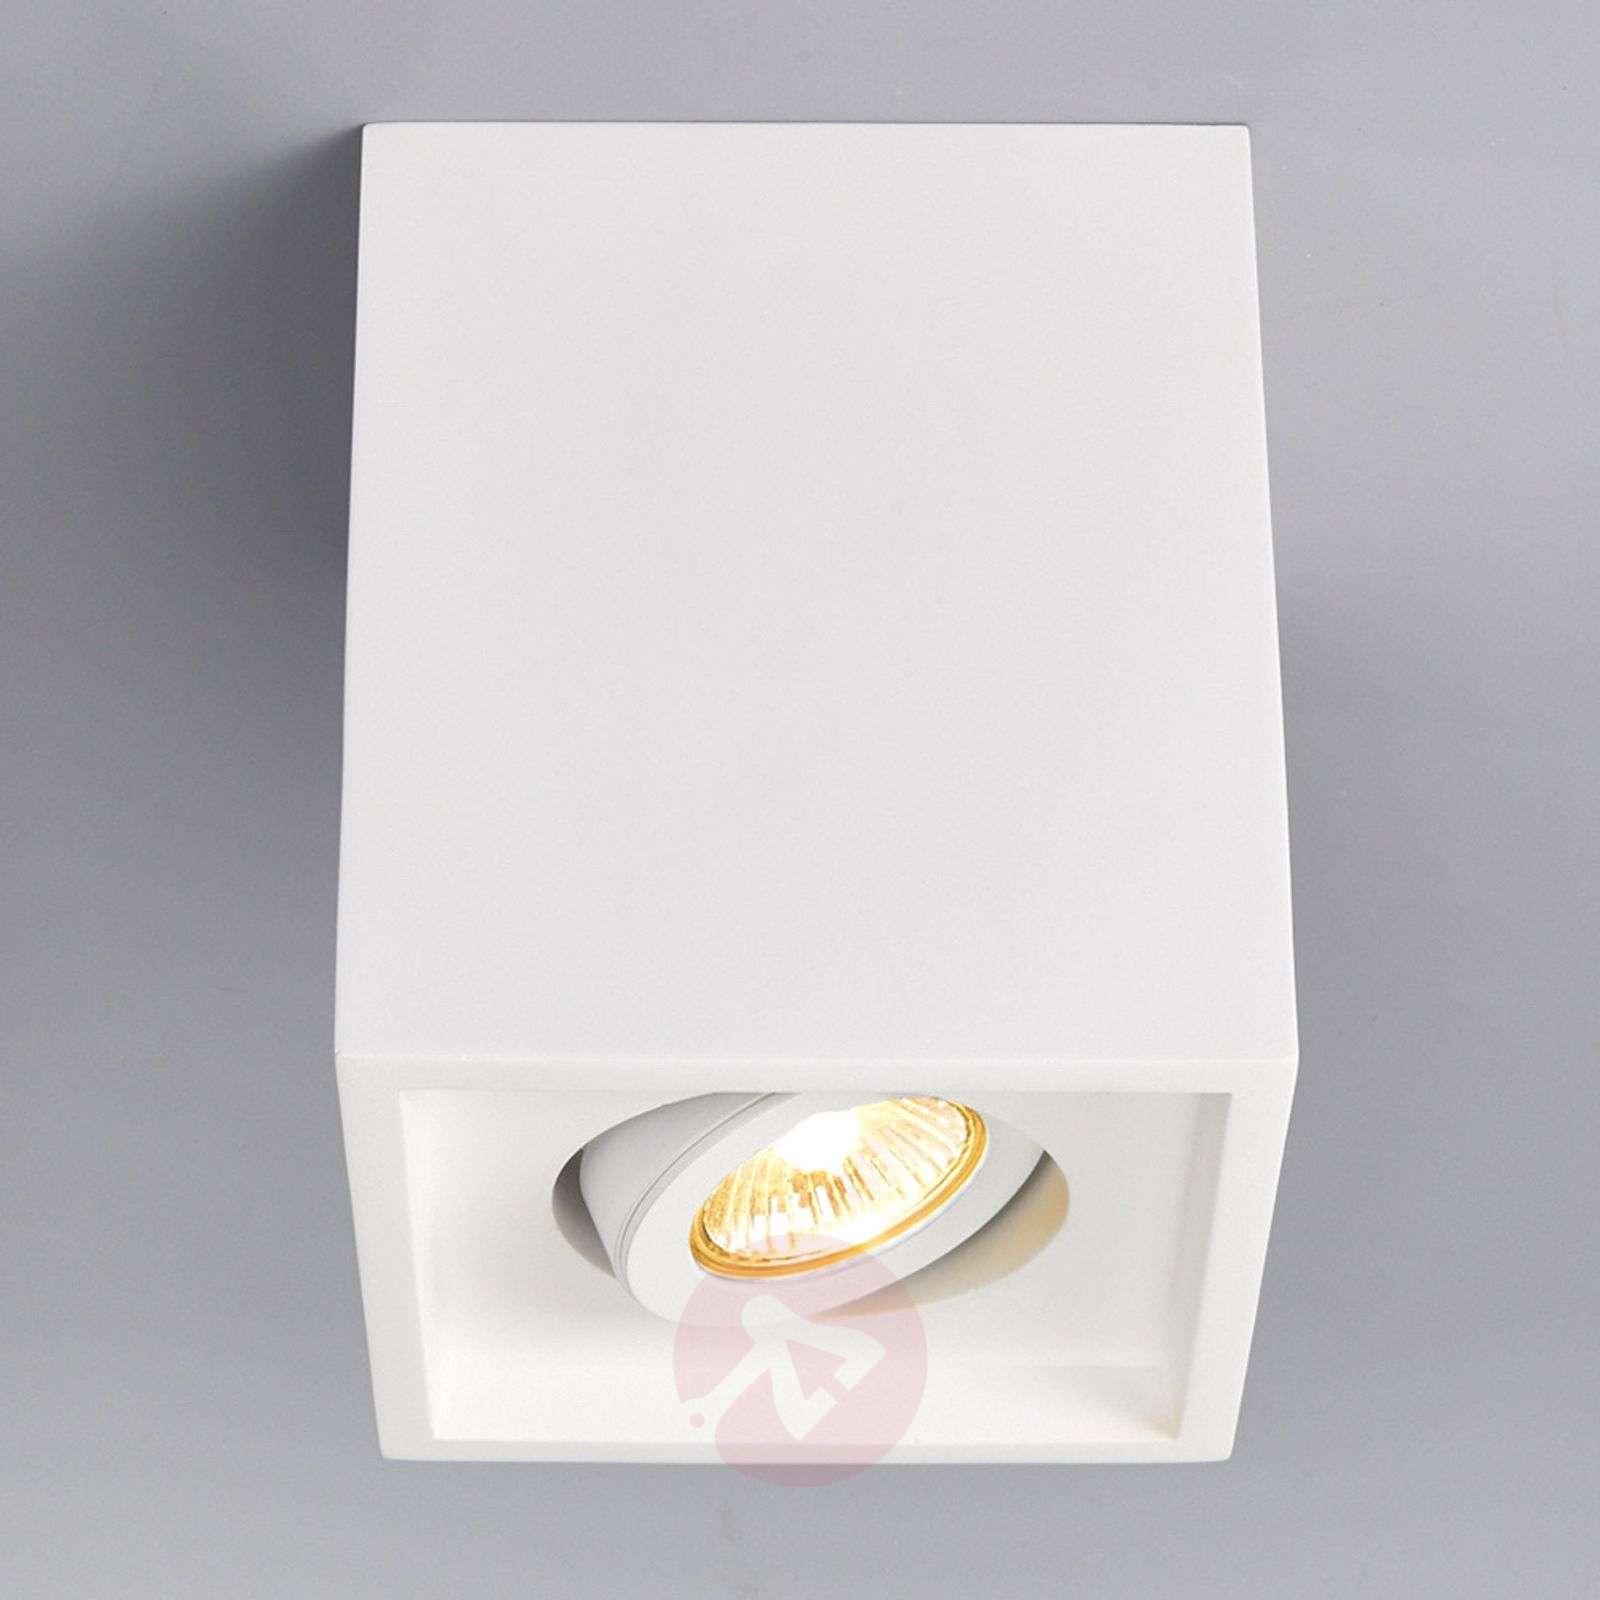 Sarina Downlight GU10 Plaster-9613032-02